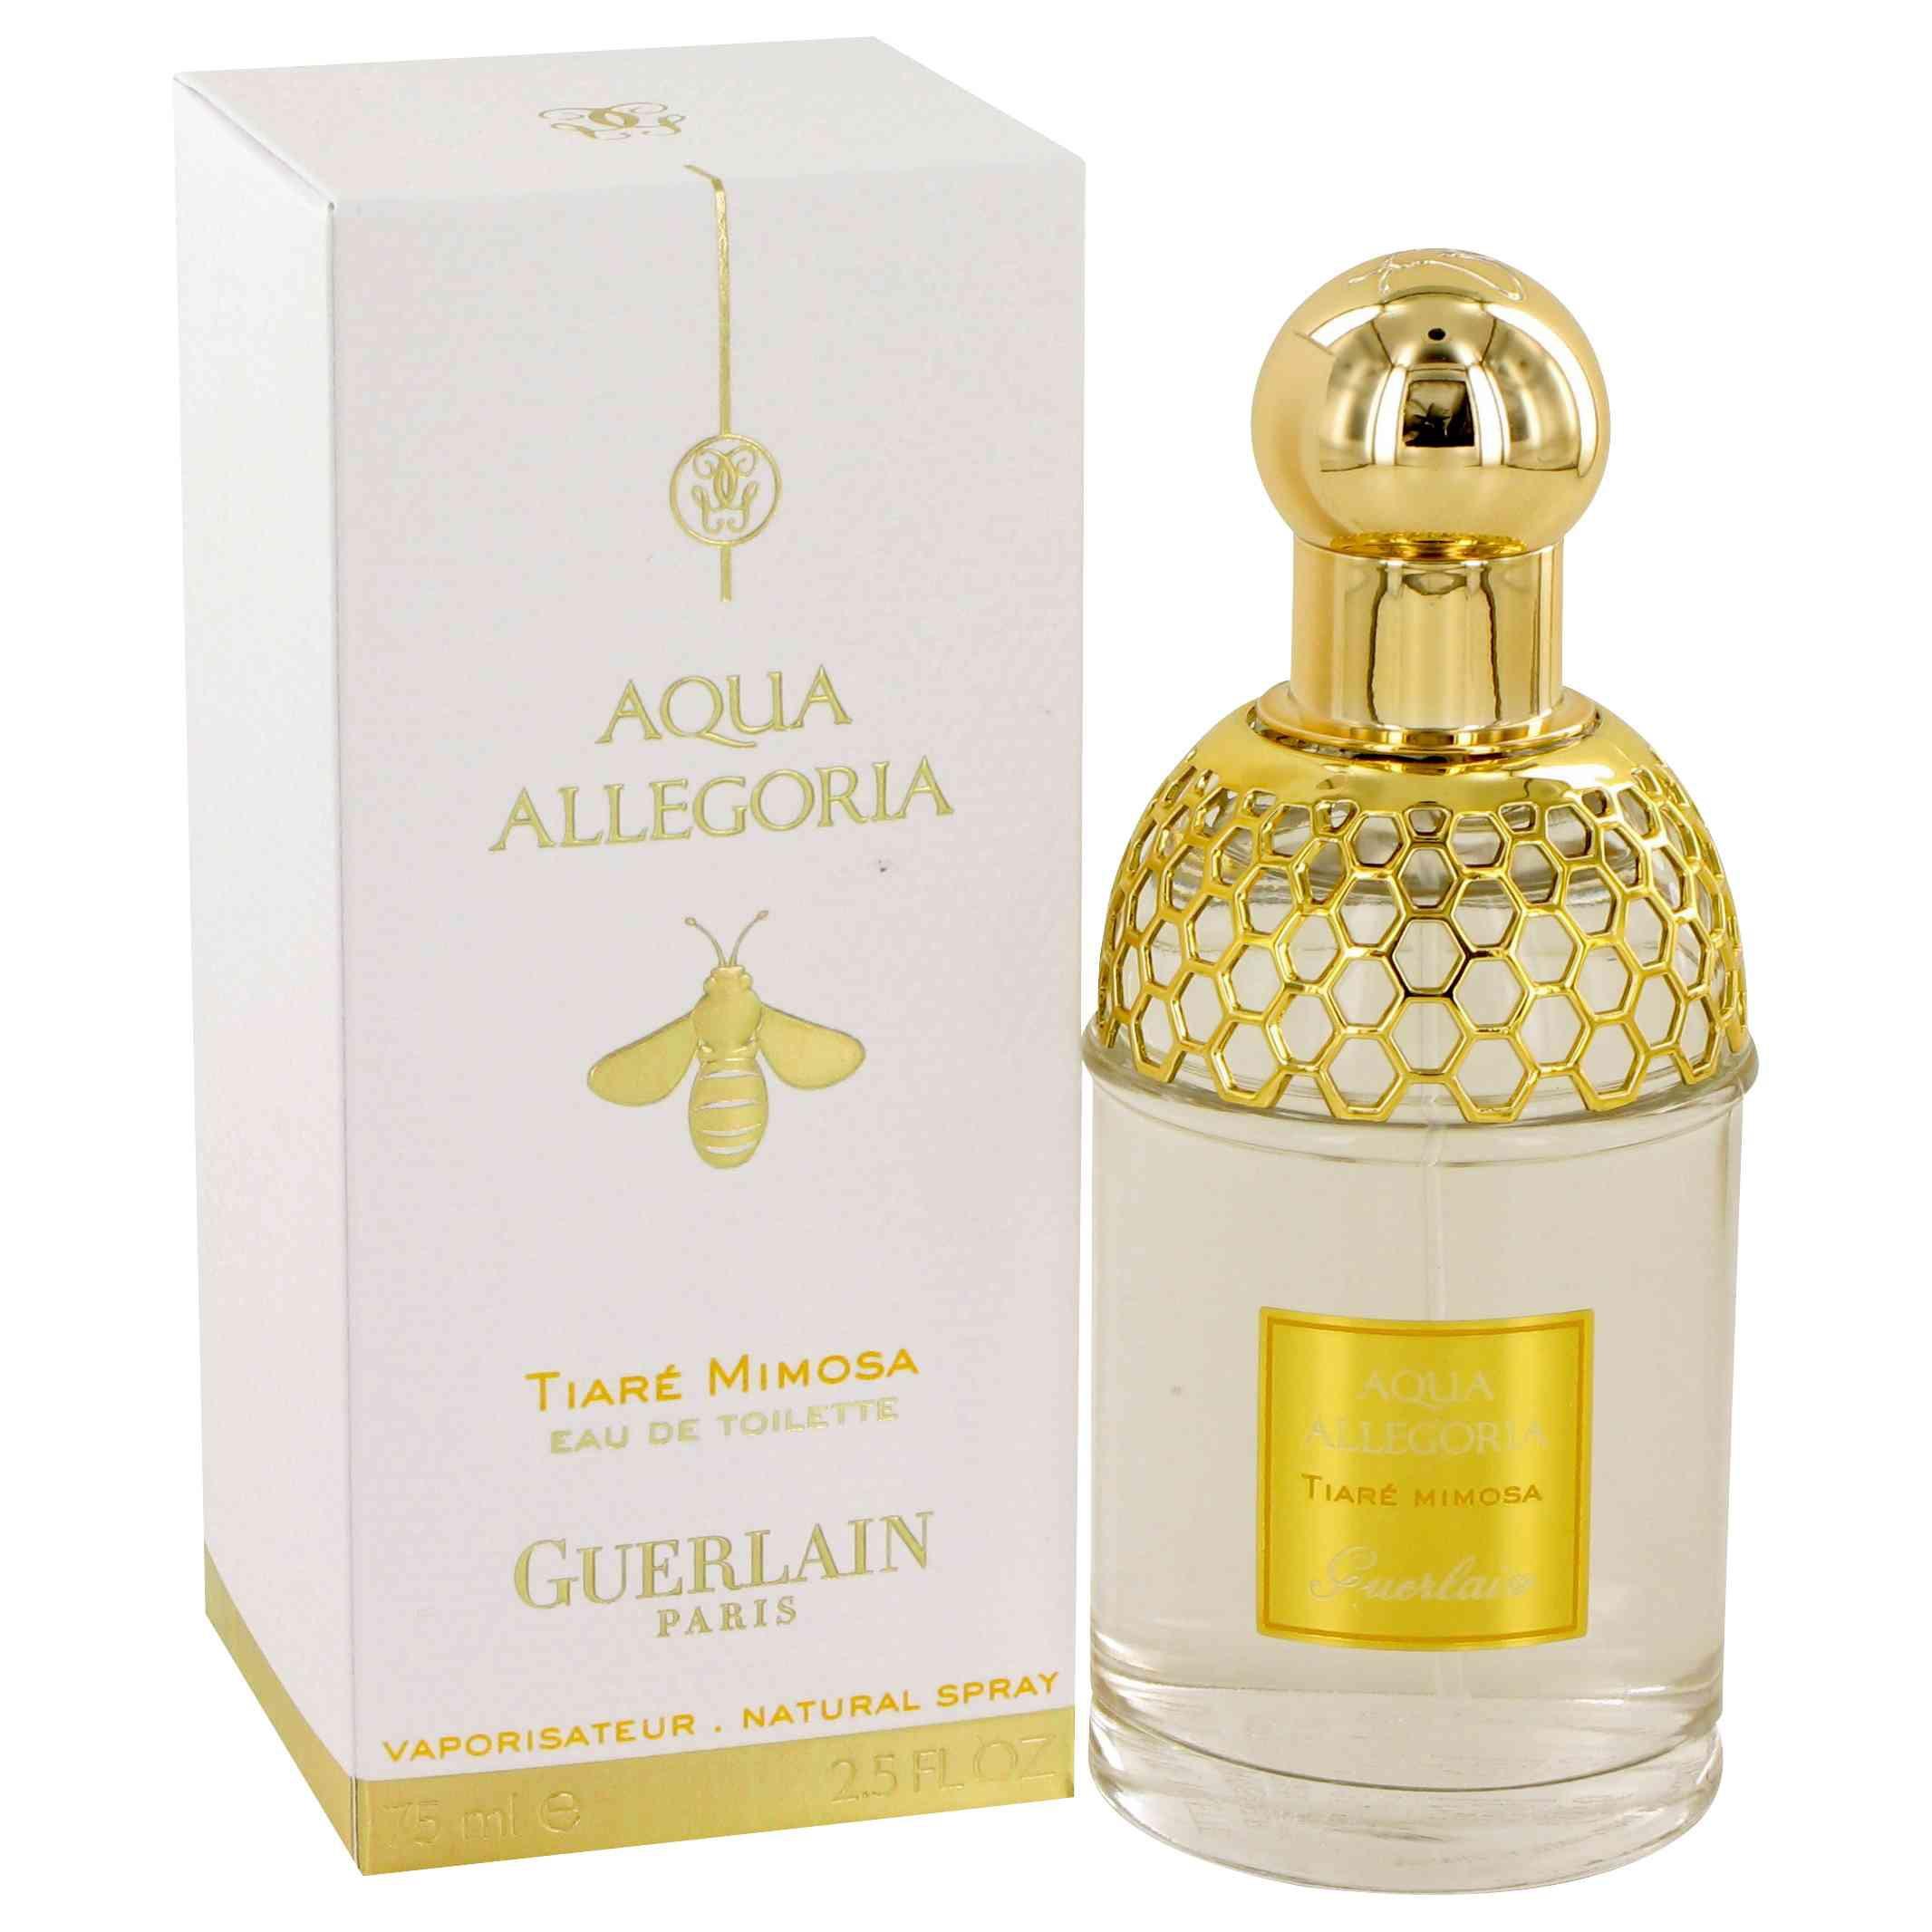 Guerlain Aqua Allegoria Tiaré Mimosa аромат для женщин